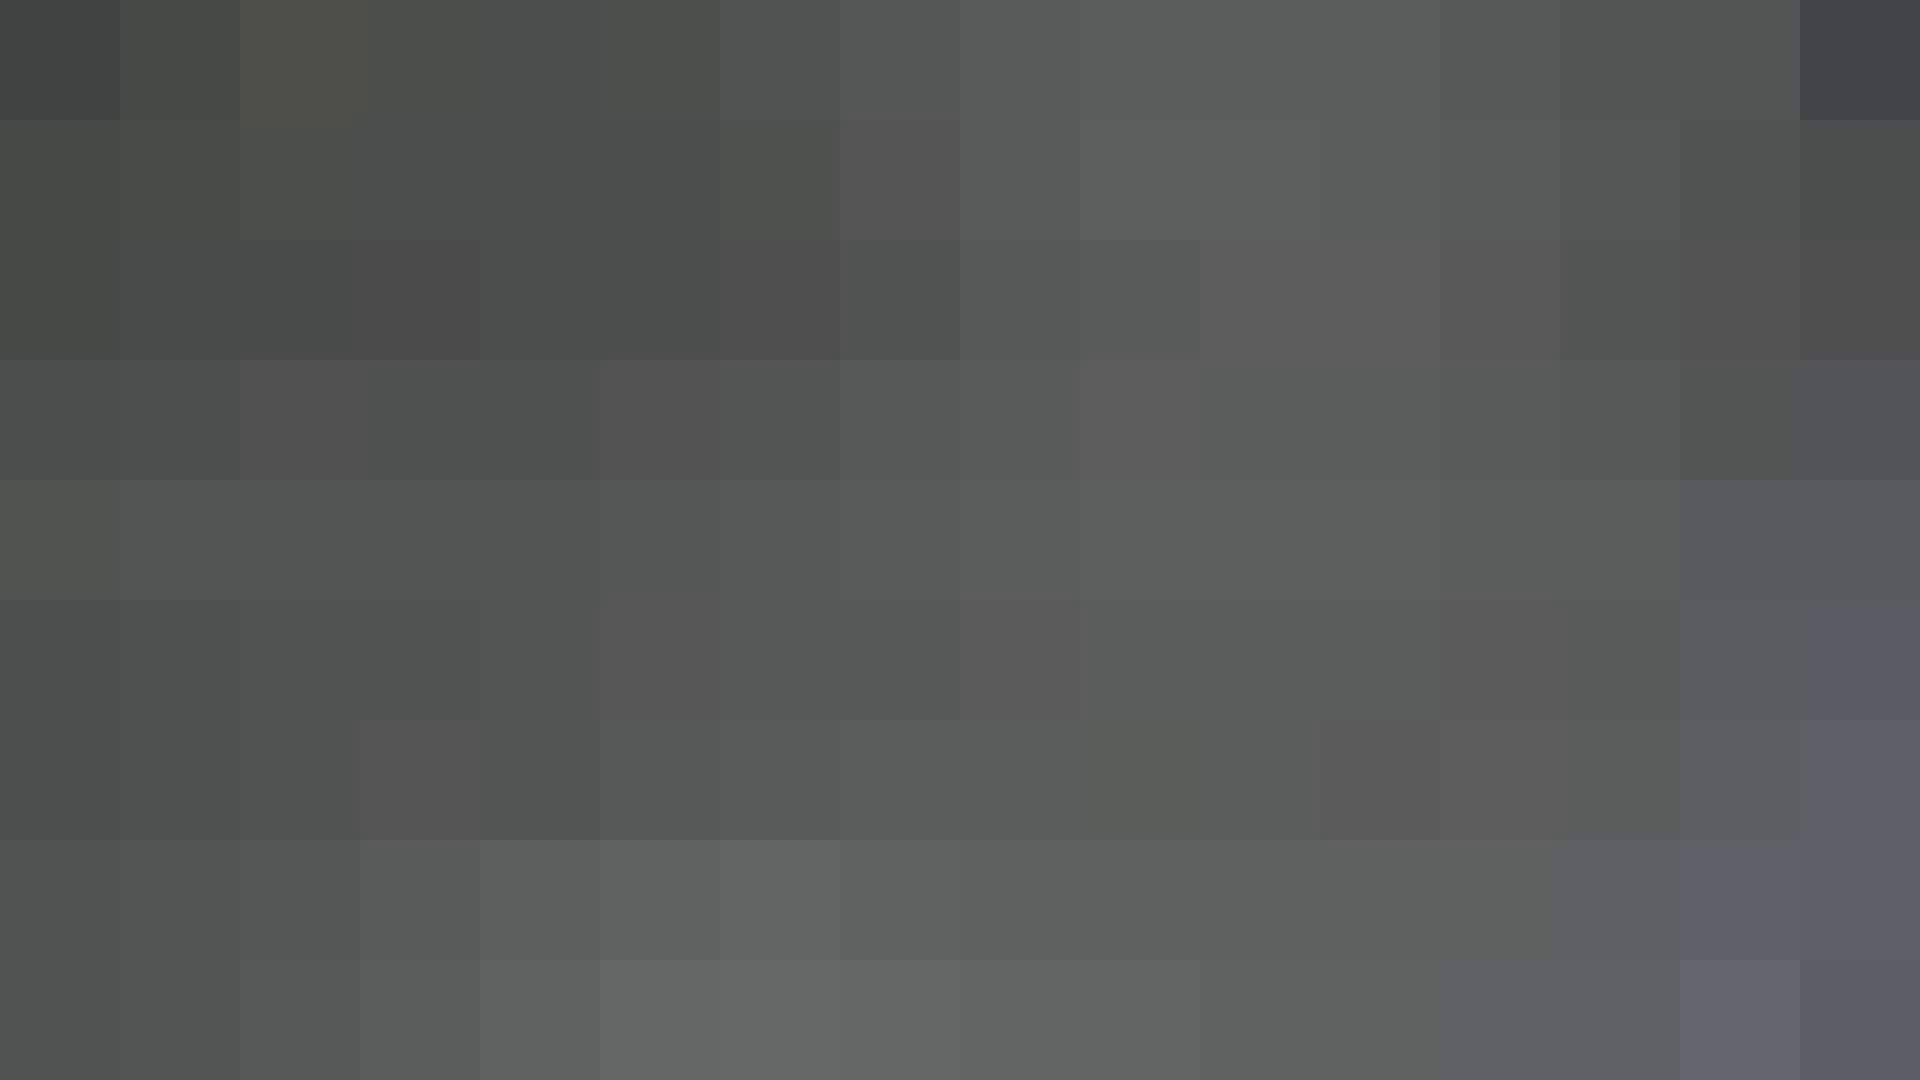 vol.27 命がけ潜伏洗面所! 小嶋陽菜似のピンクオシャレさん 美人 アダルト動画キャプチャ 78pic 74